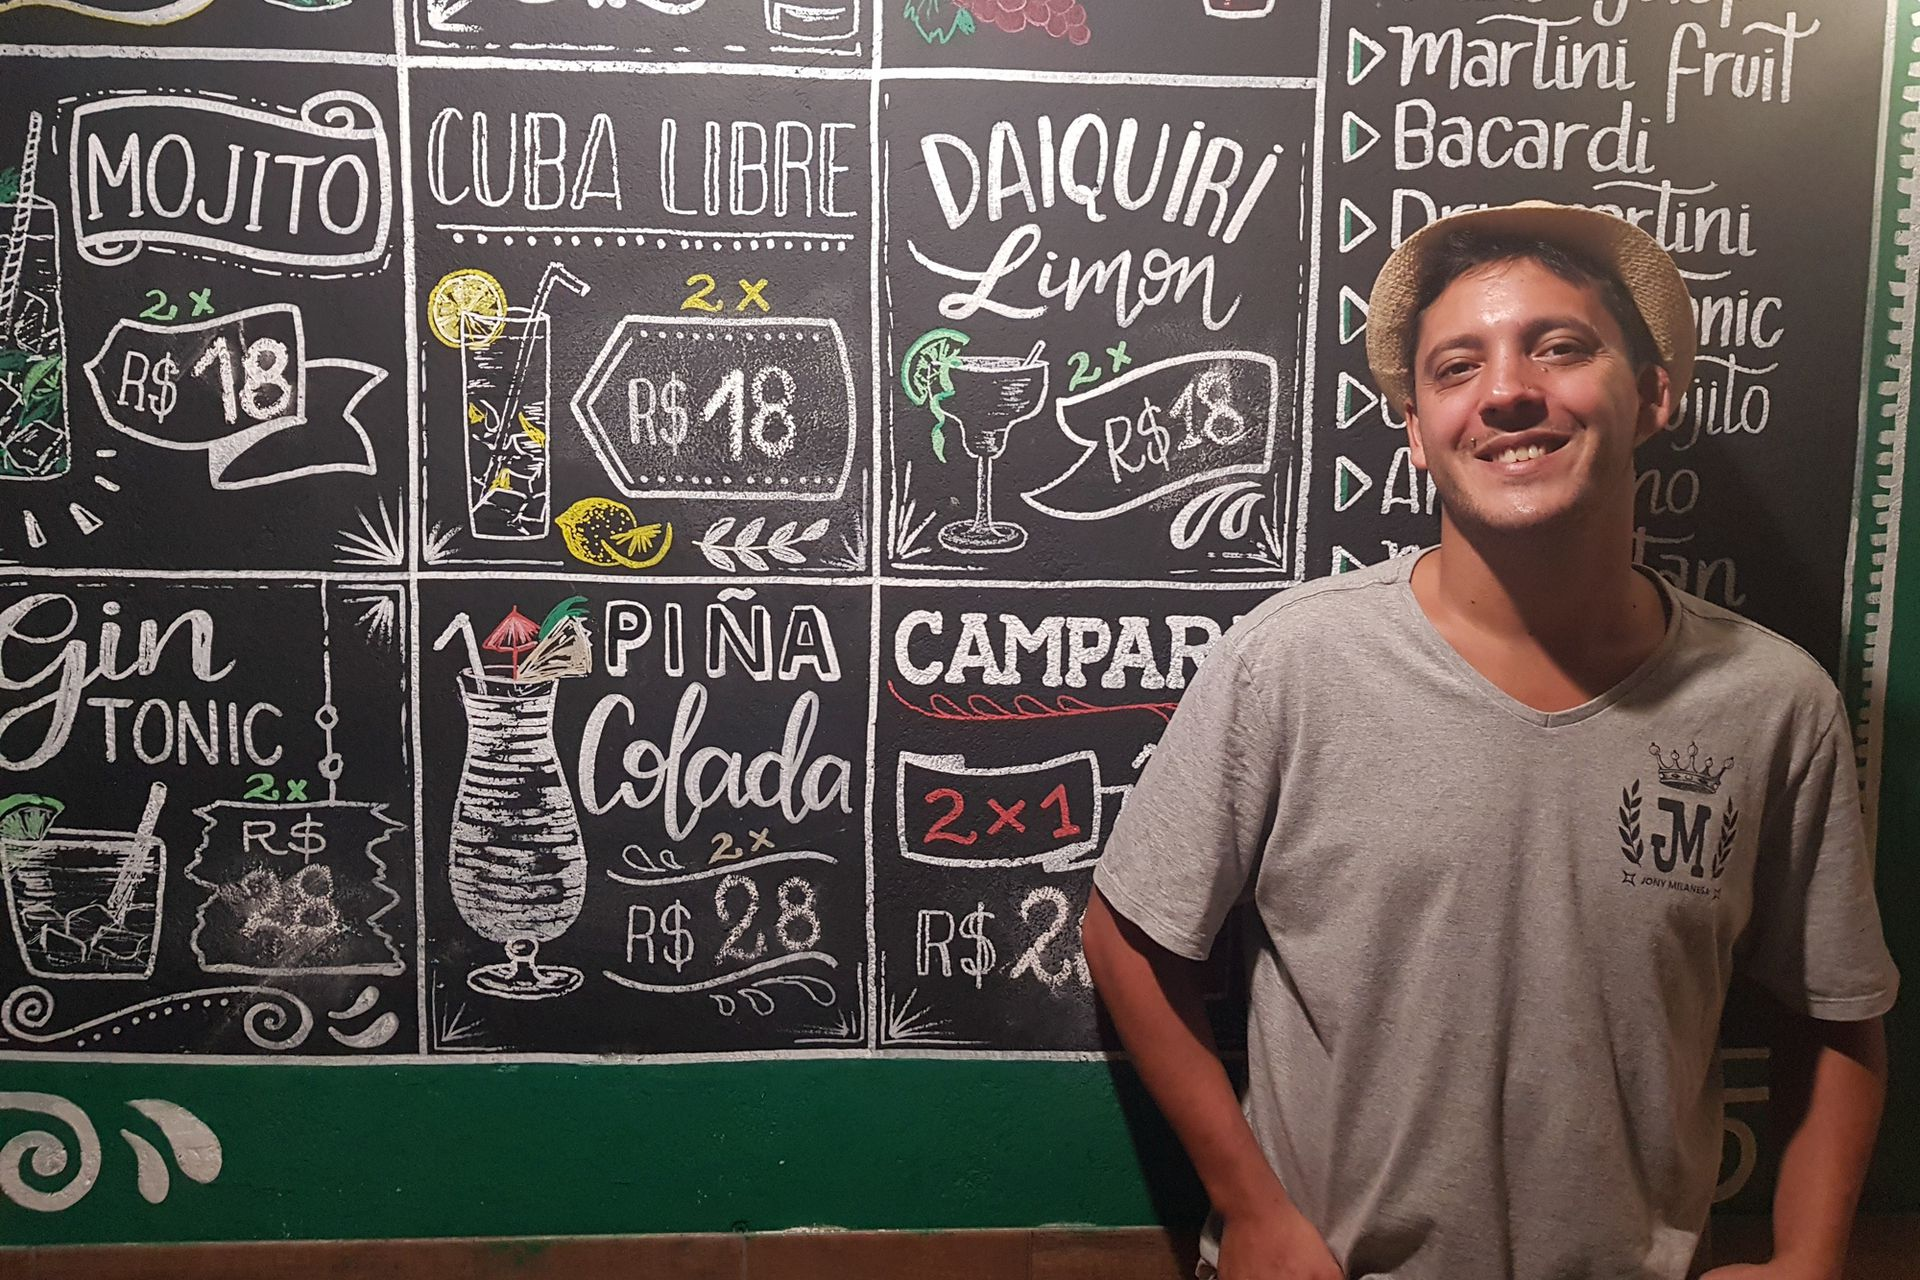 Jonathan Chirivino se convirtió en Jony Milanesa en el Morro de Sao Paulo